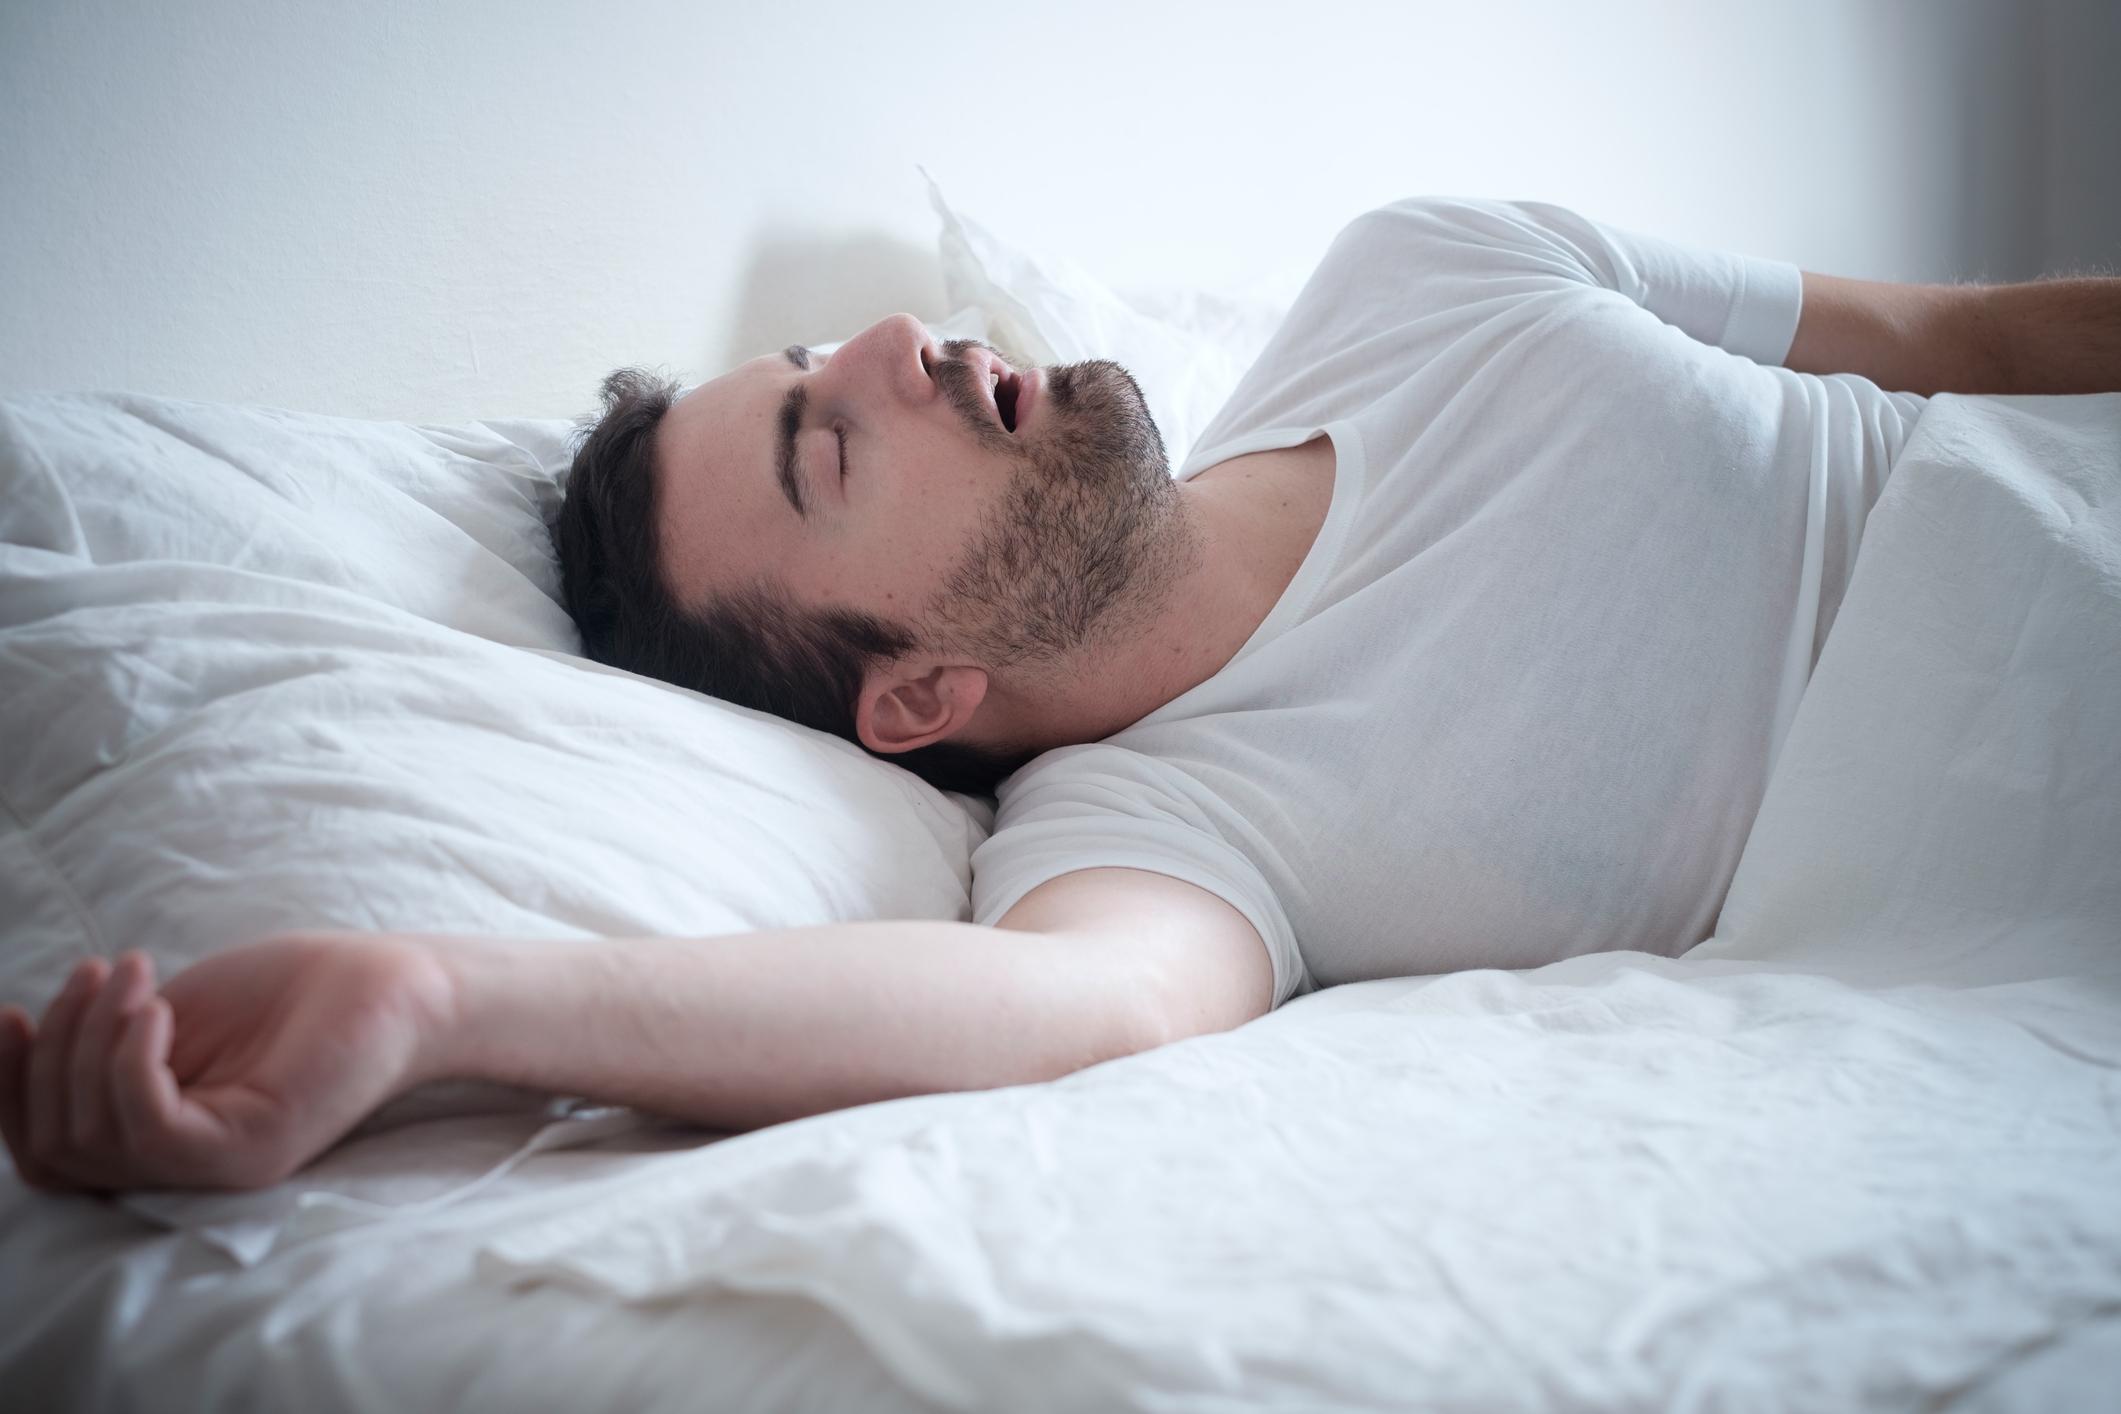 Dental 101: Treating Snoring & Sleep Apnea